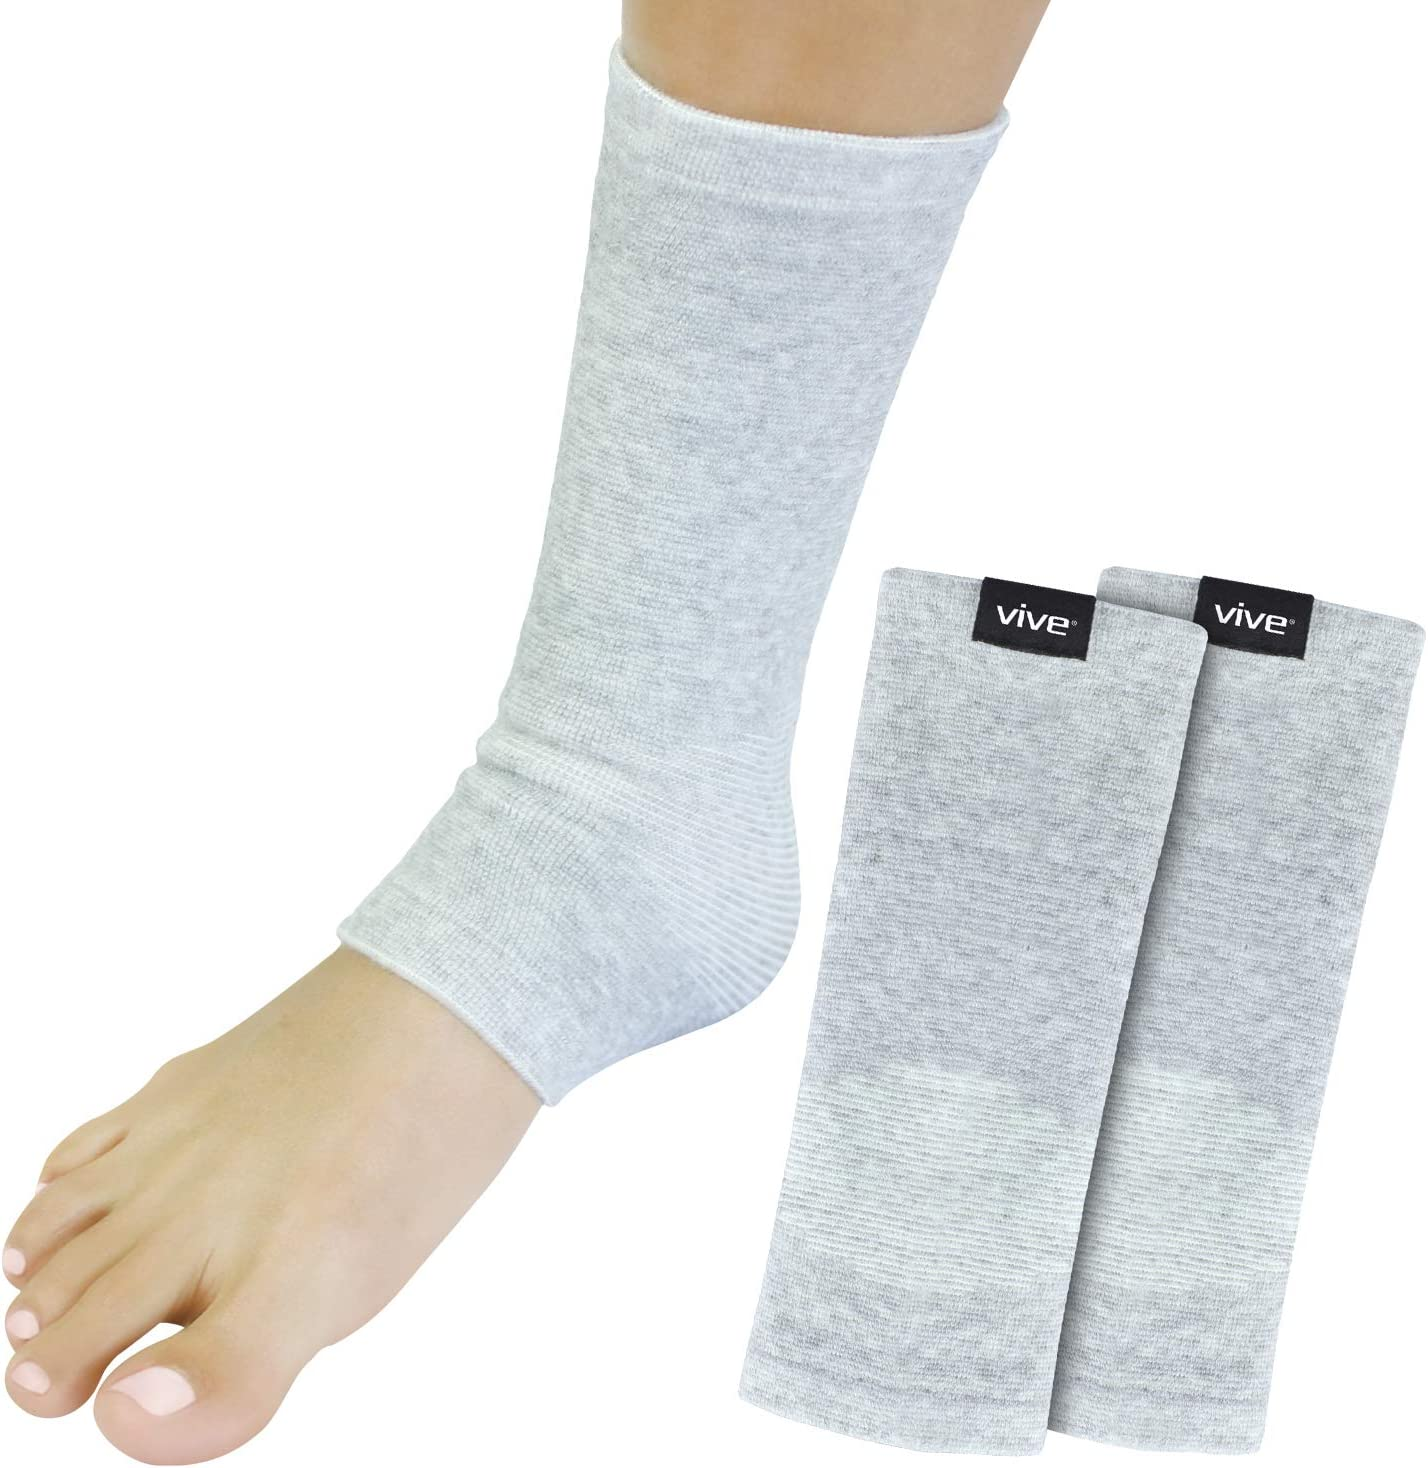 Vive Ankle Compression